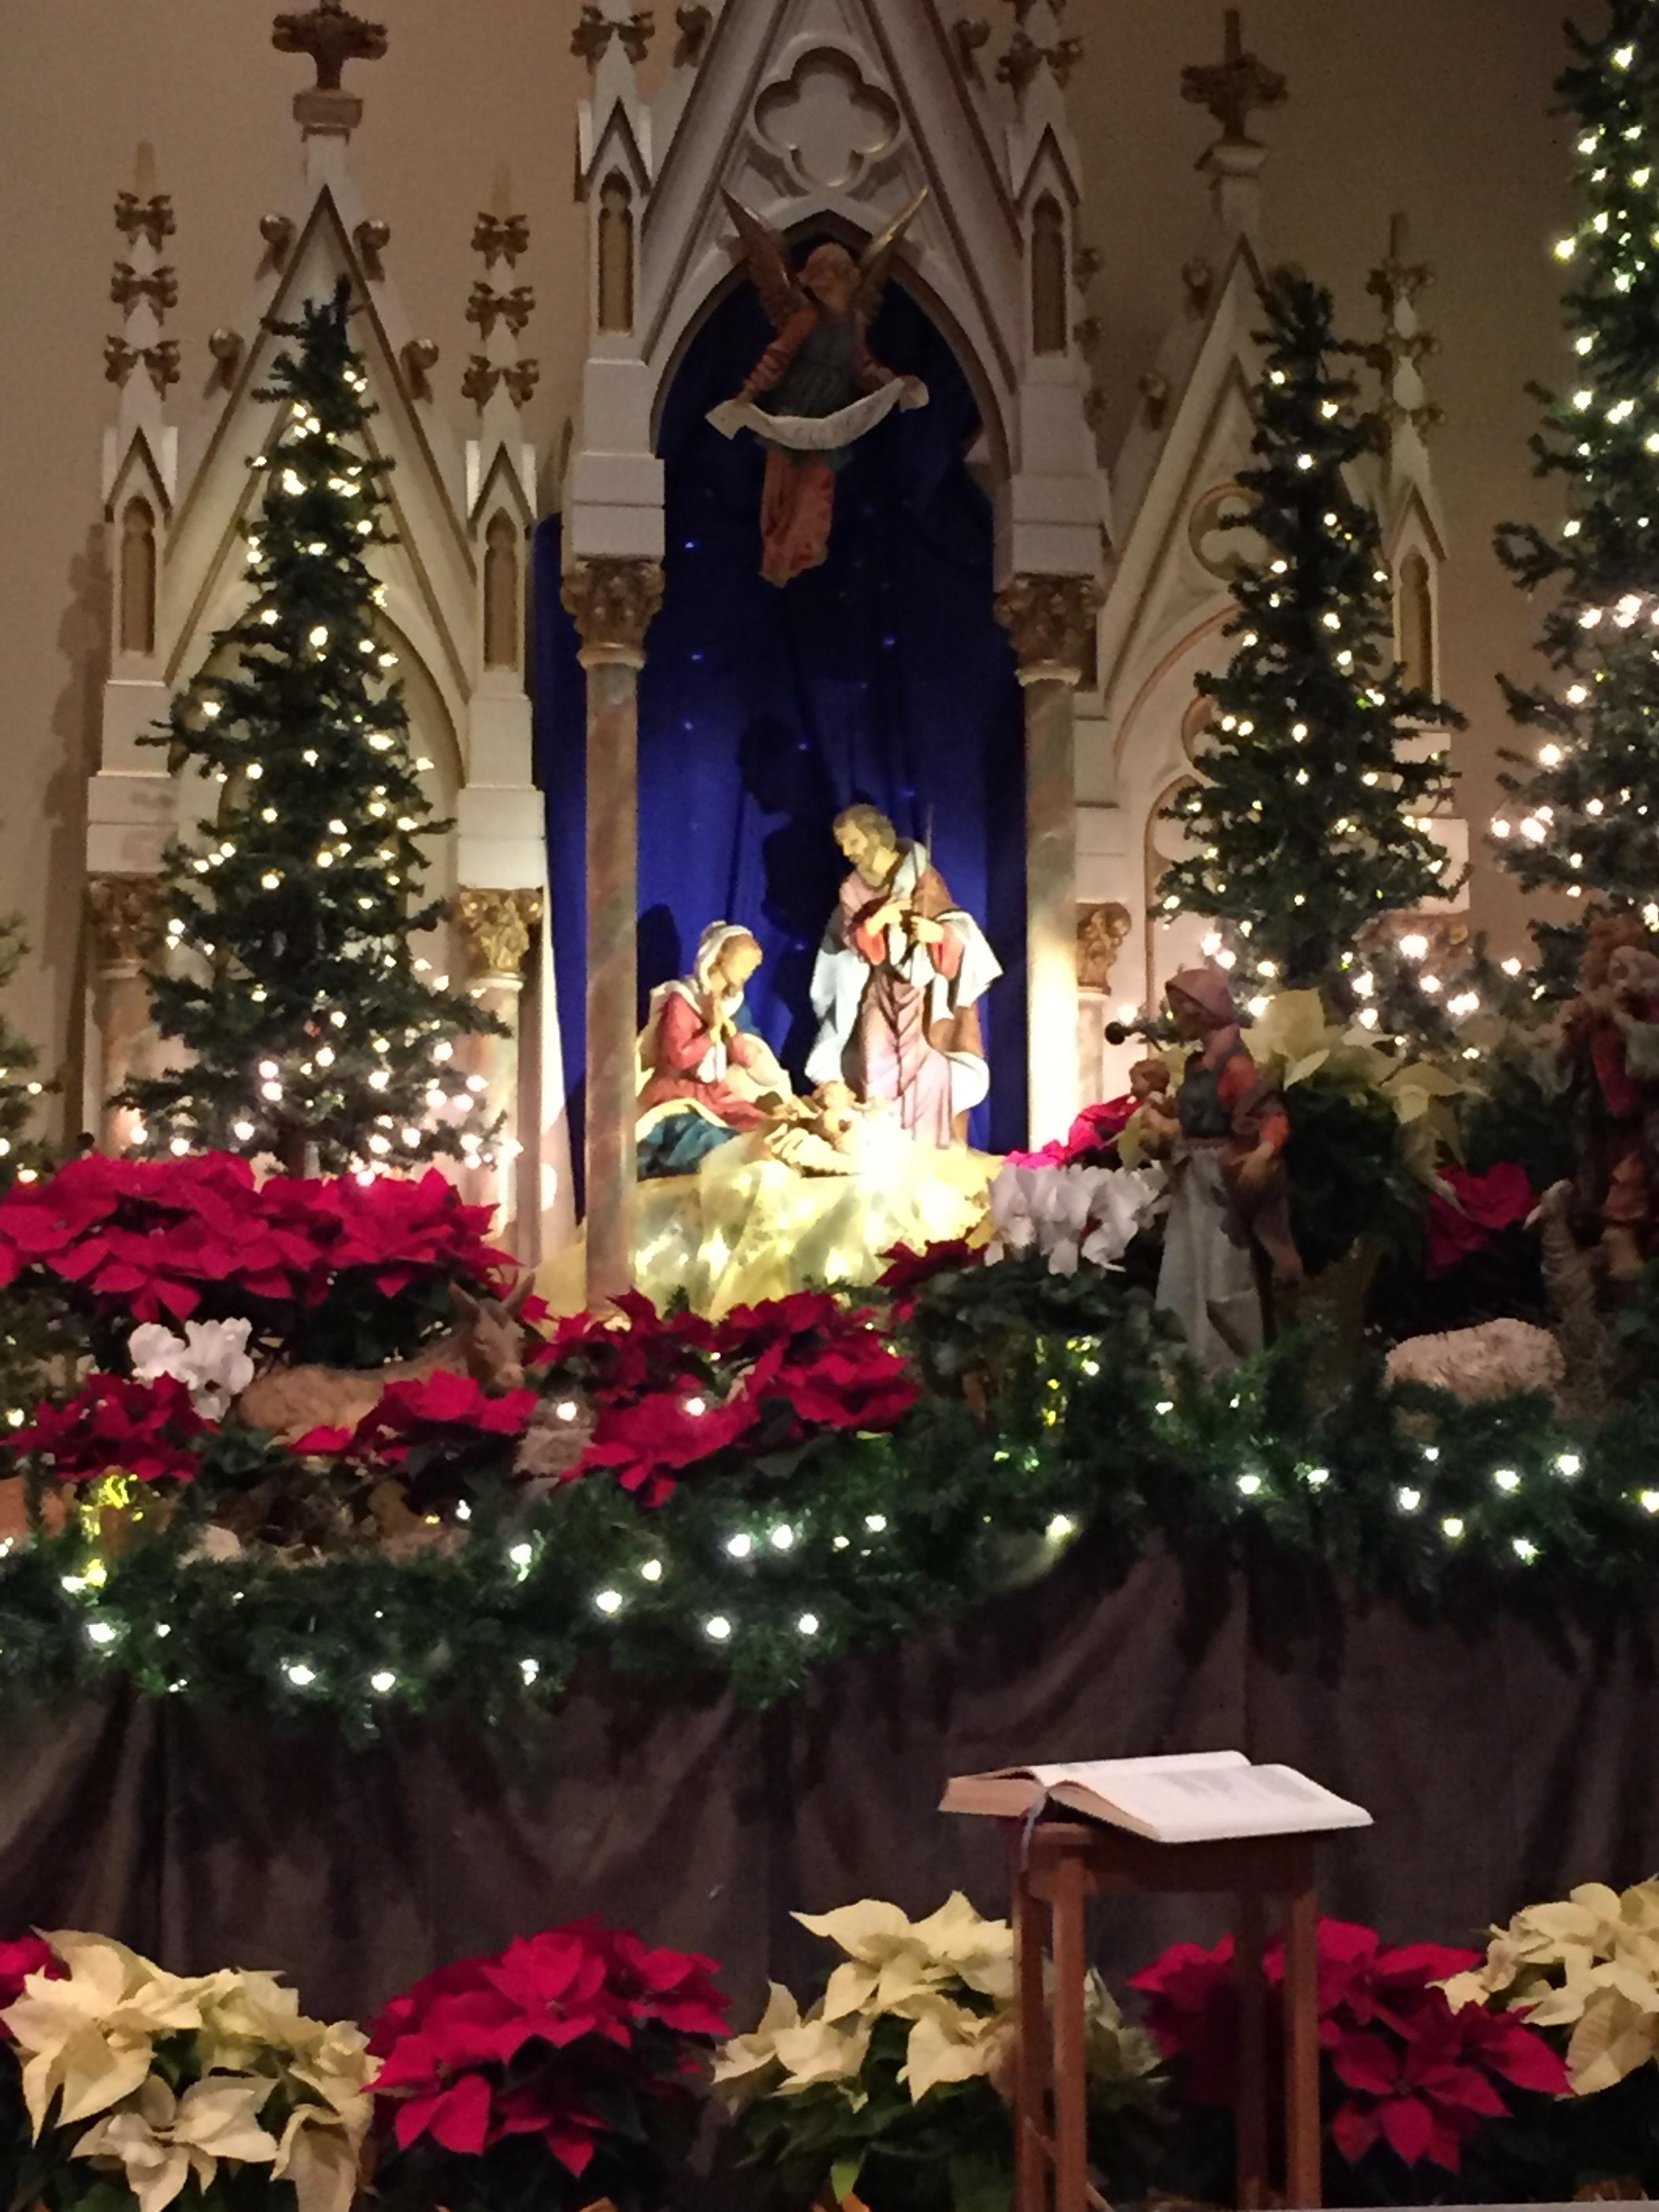 The Nativity scene at my parish.